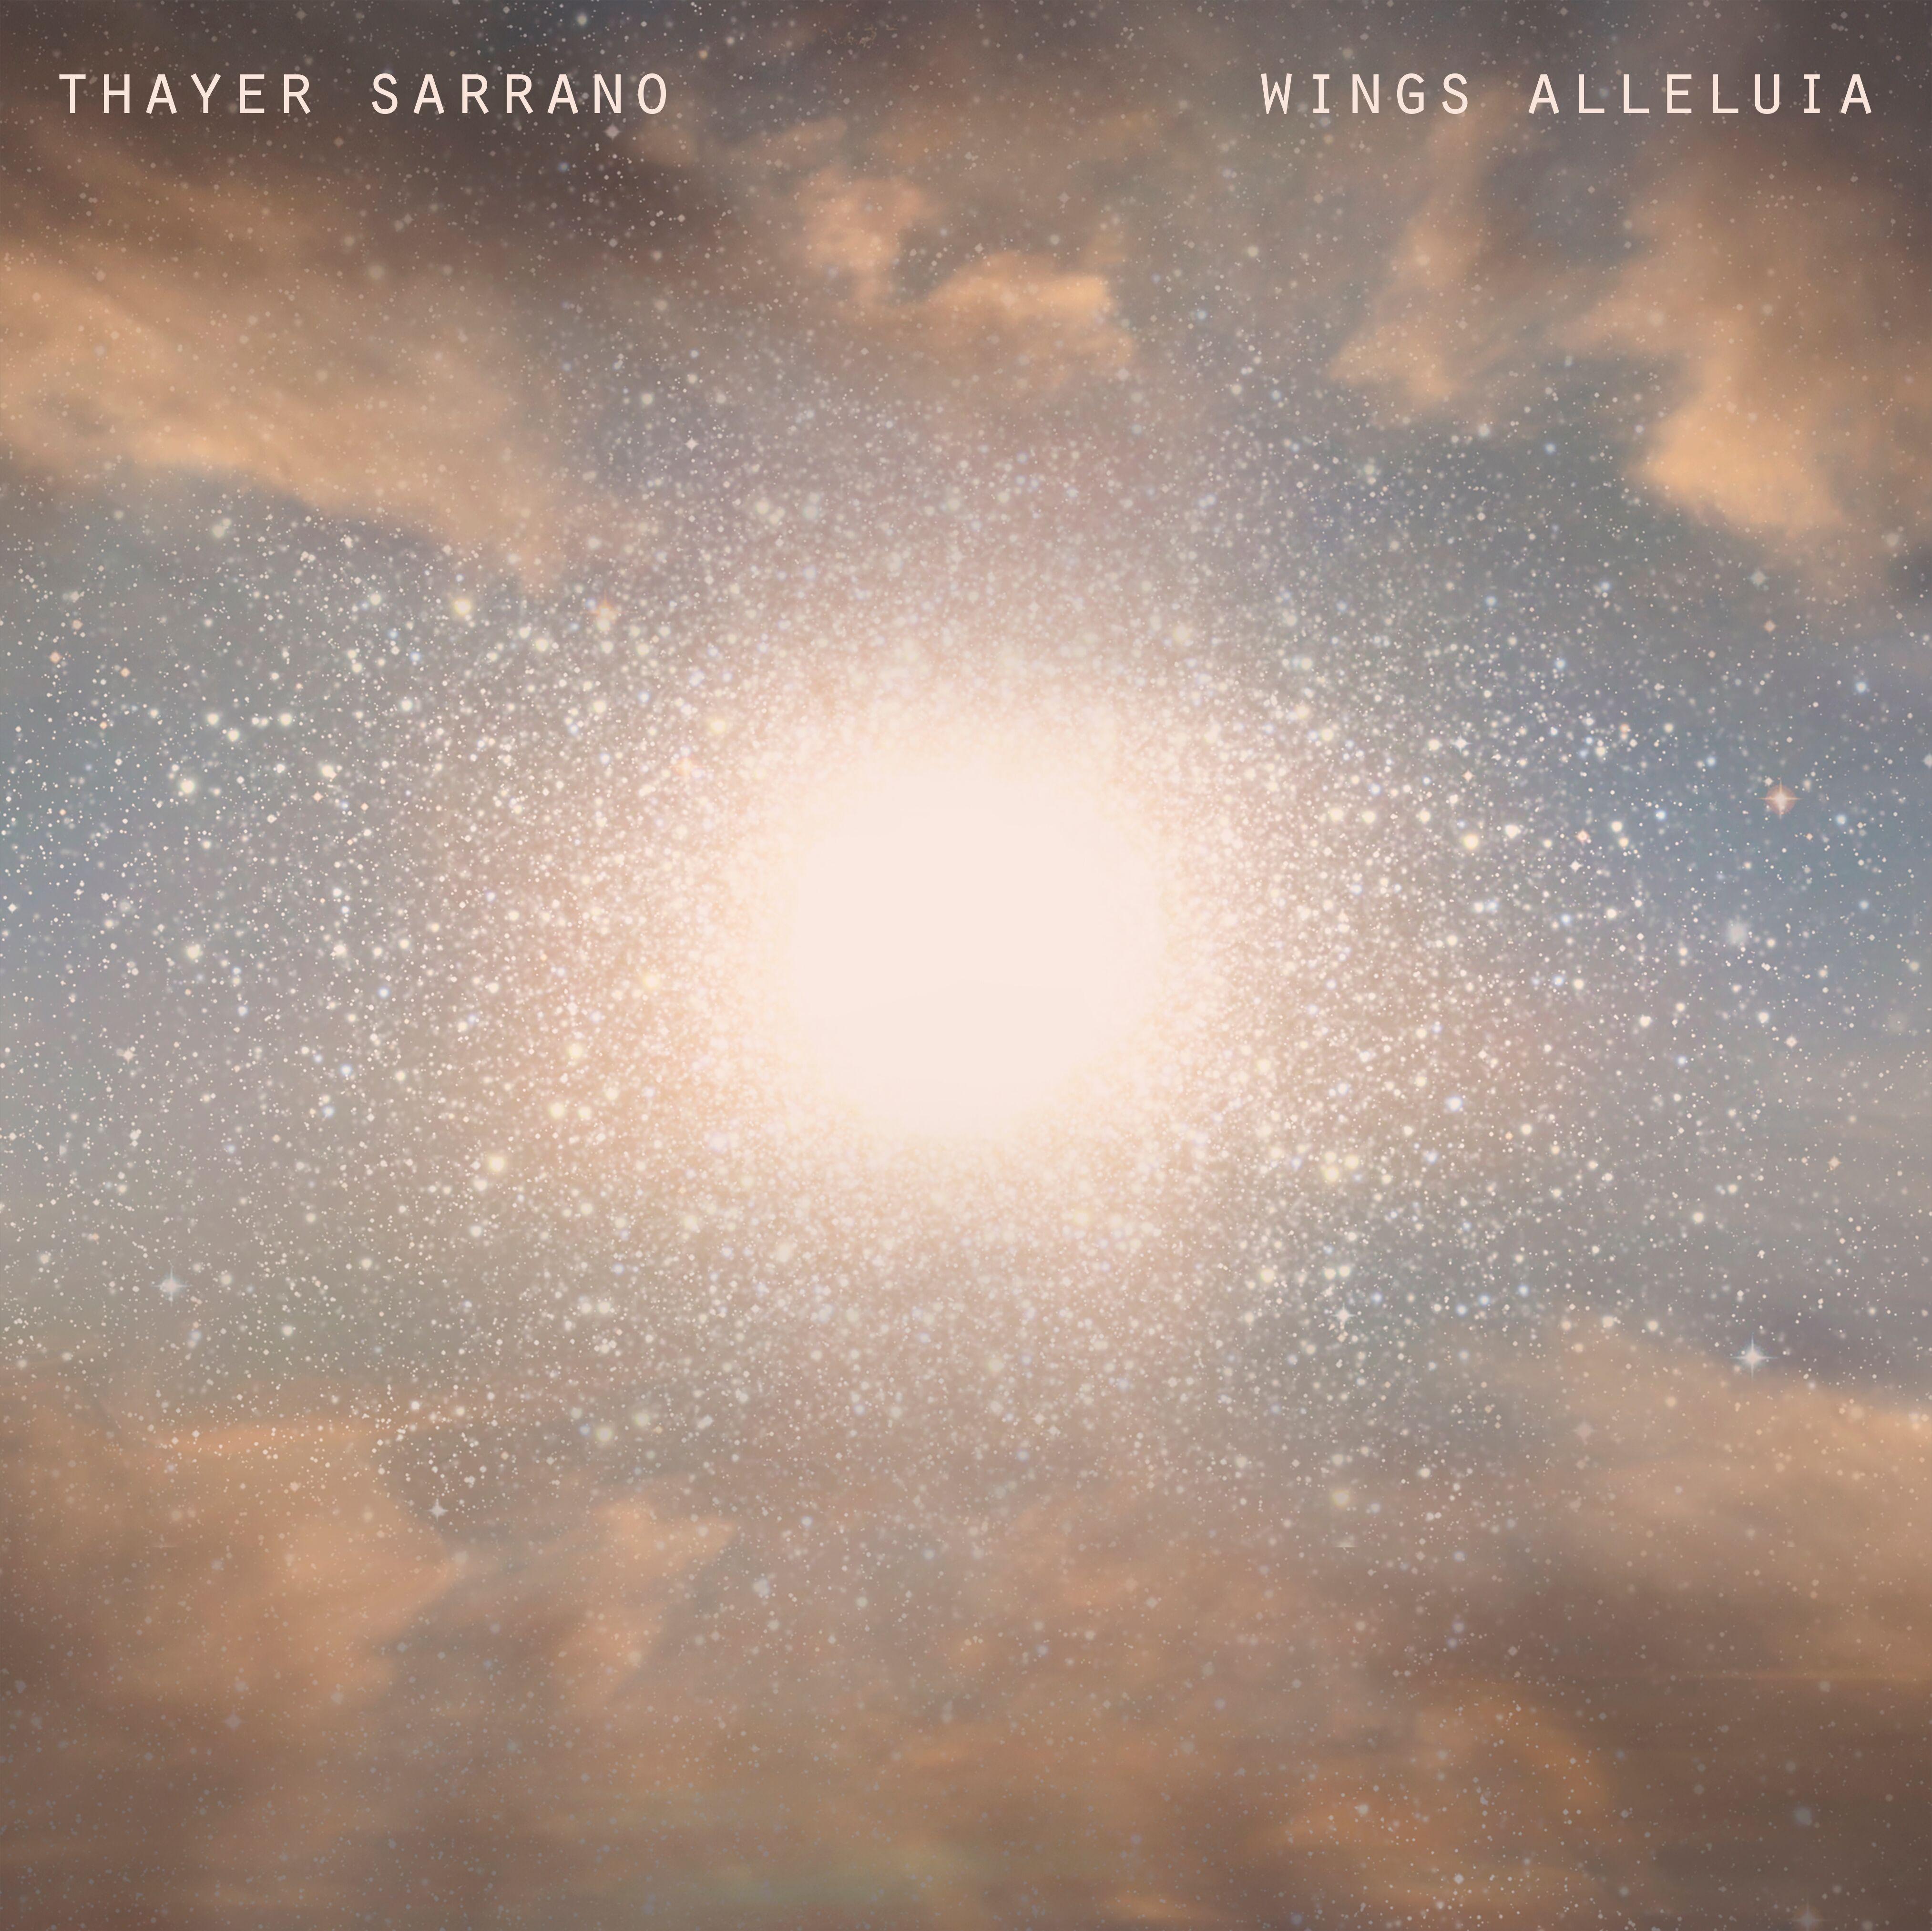 THAYER SARRANO Discusses Her Most Recent Album, 'Wings